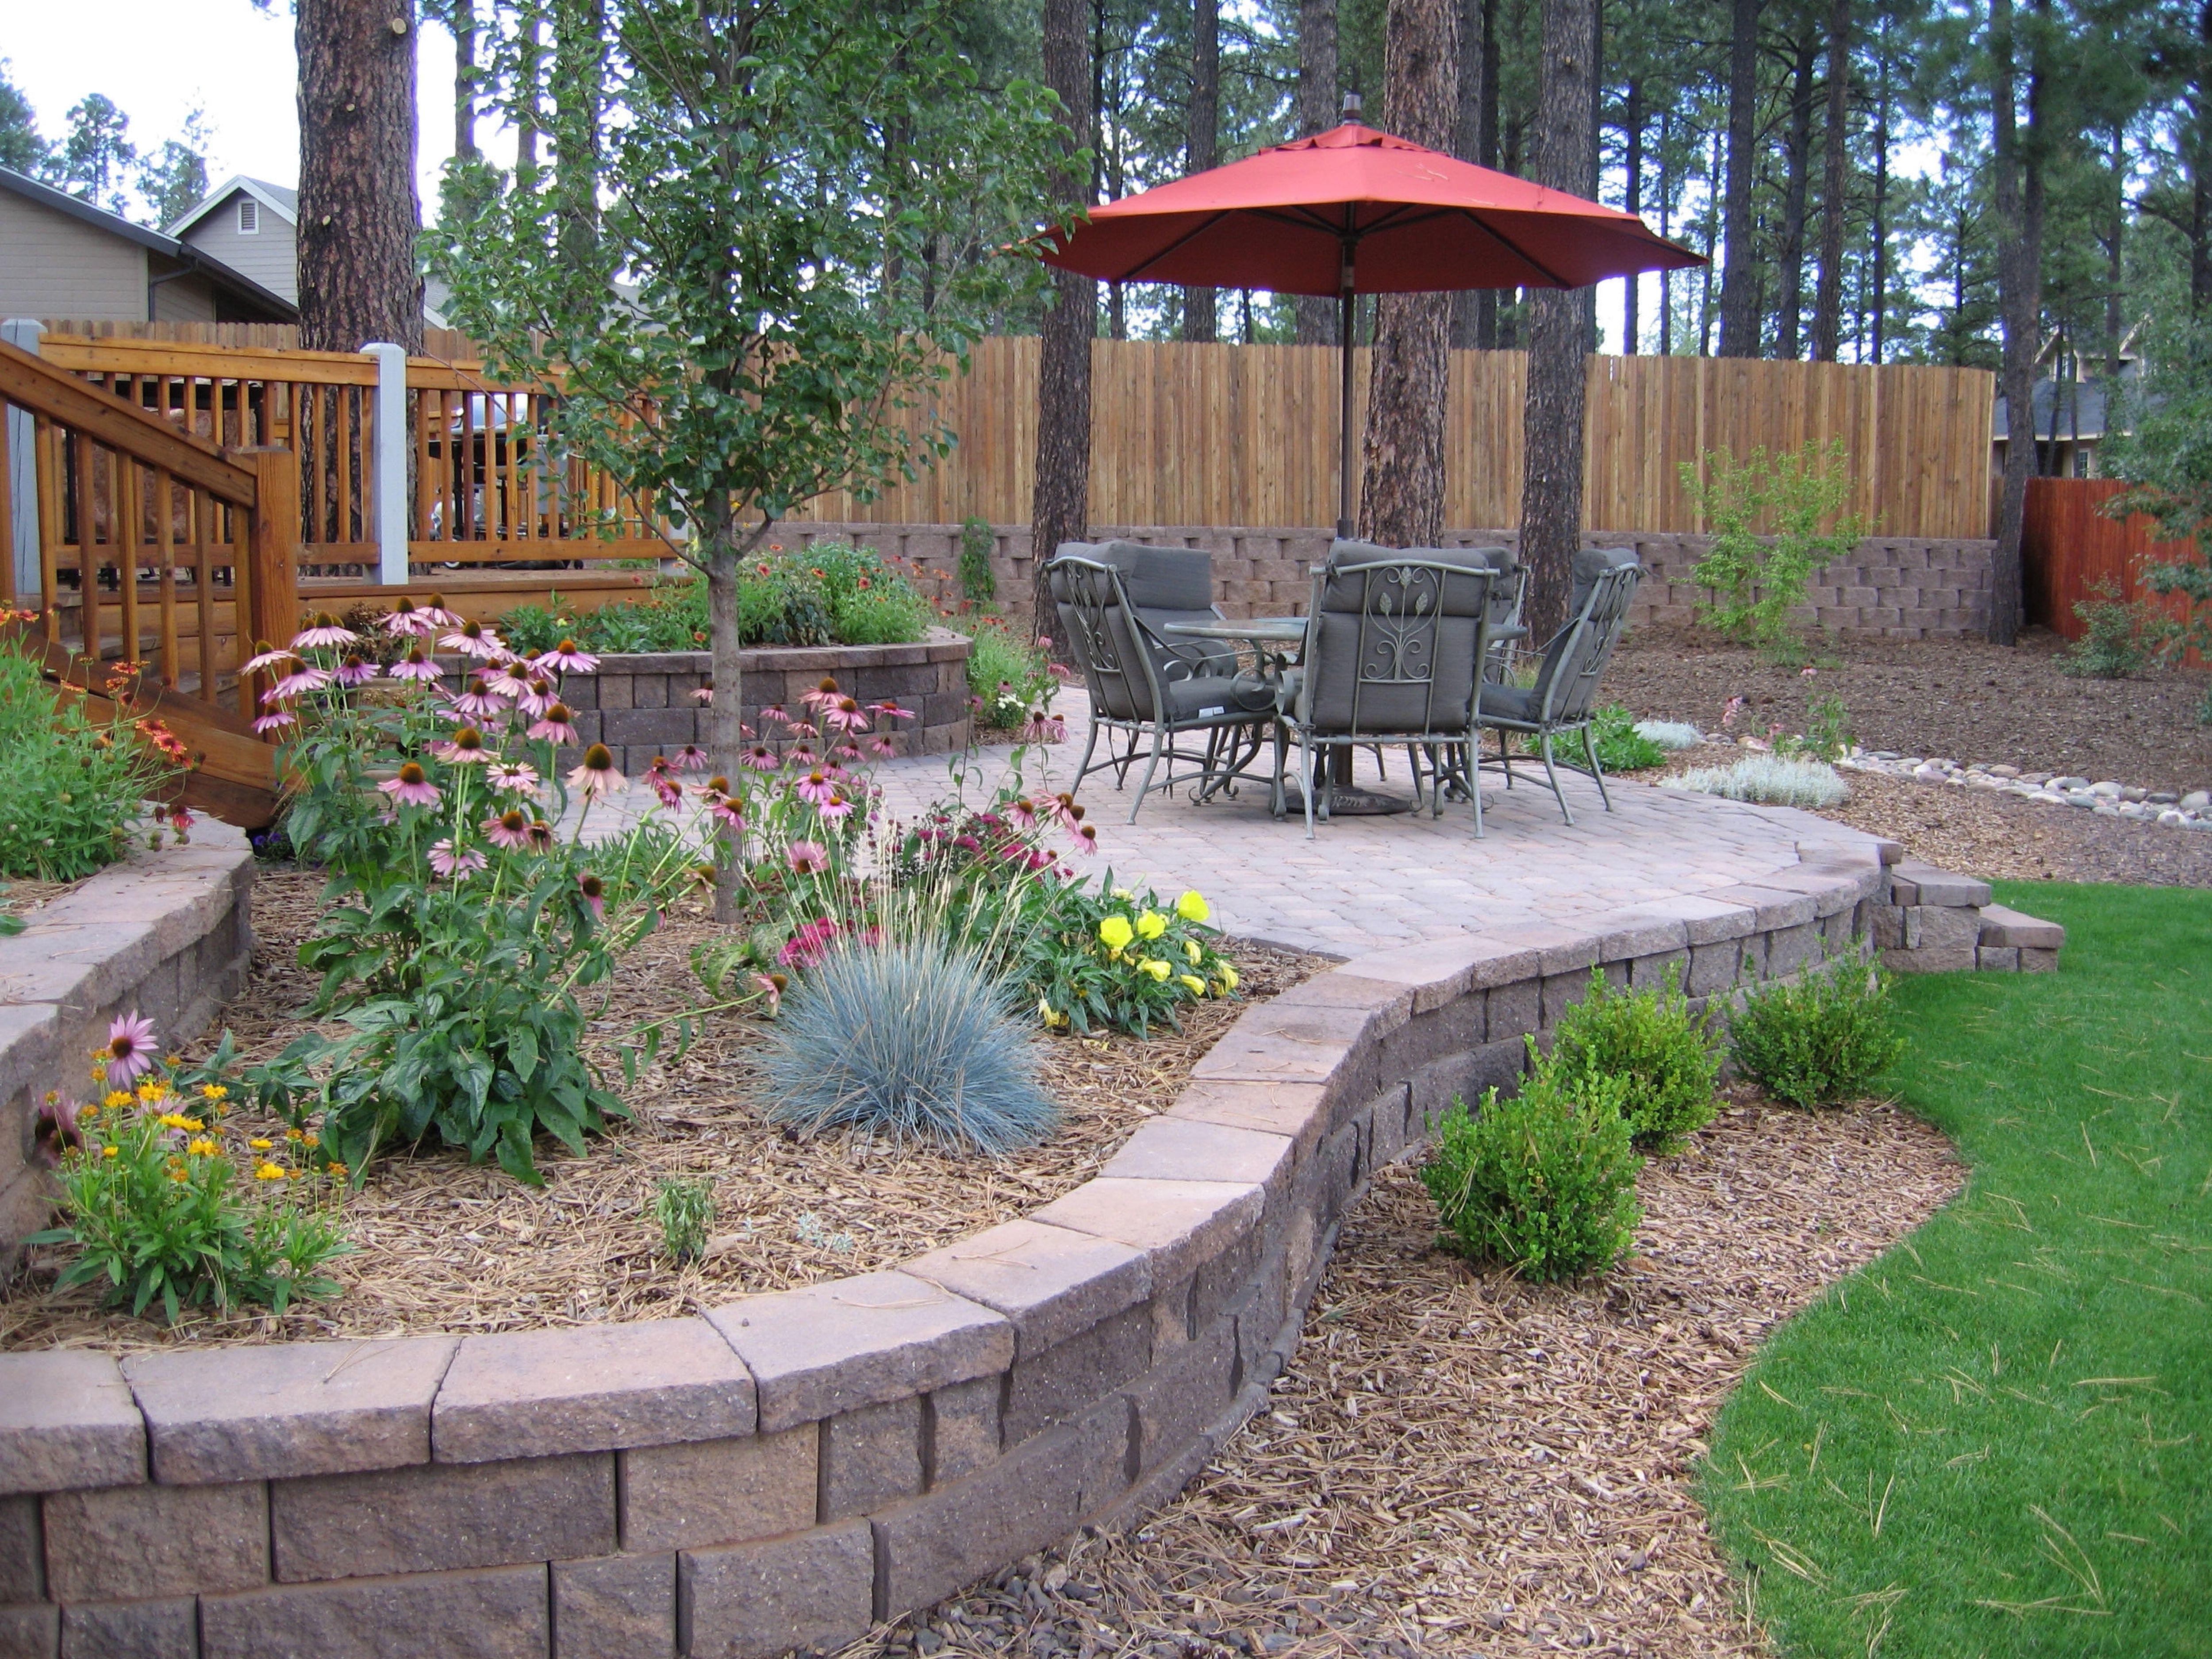 yard garden design ideas photo - 1